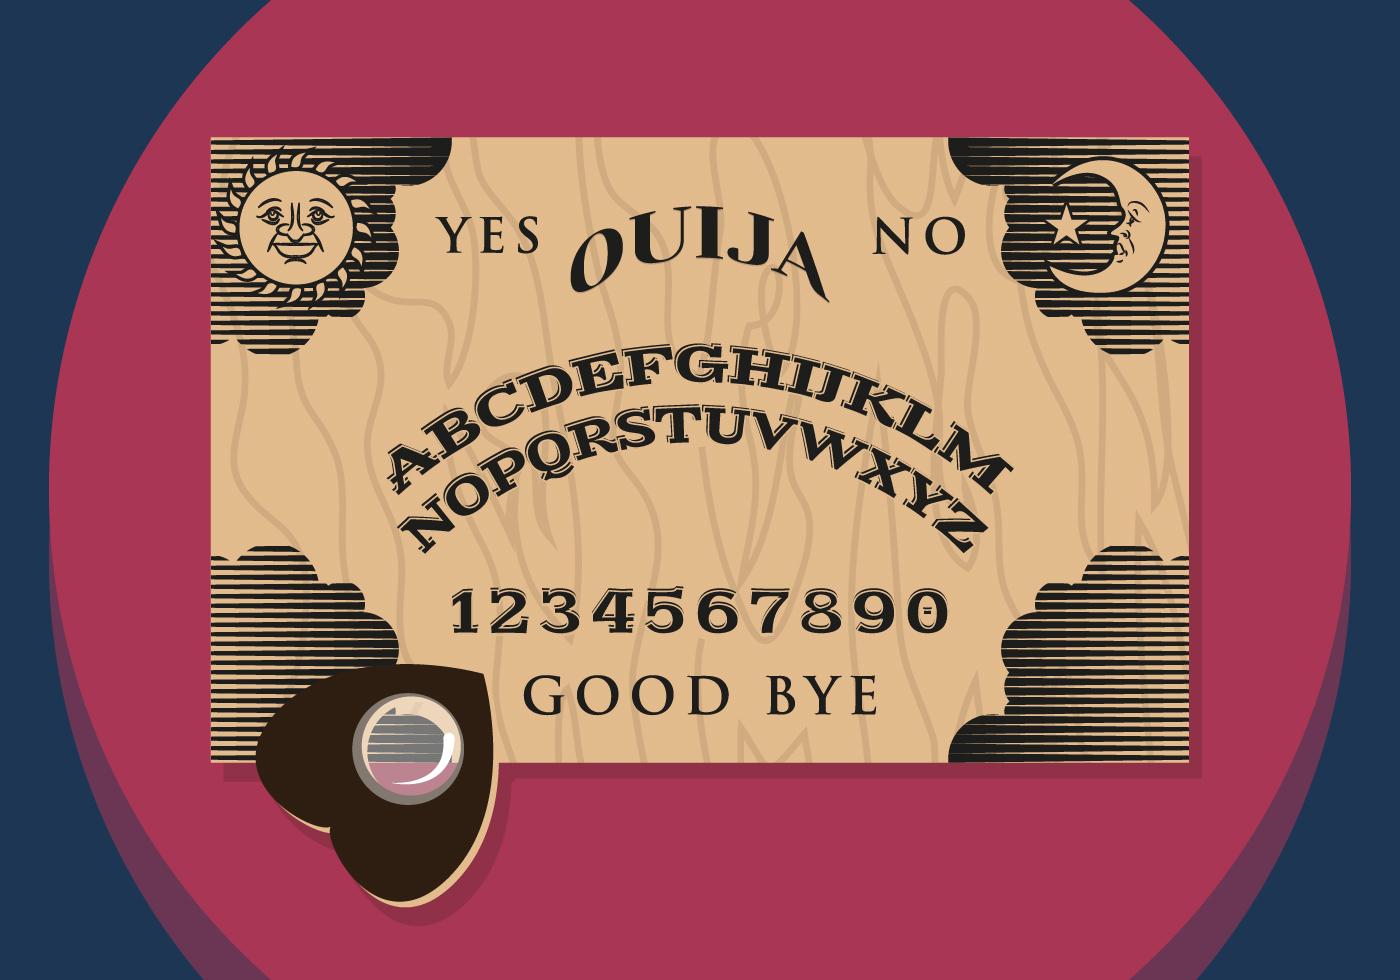 Ouija Illustration Vectorial - Download Free Vector Art ... Crystal Ball Fortune Teller